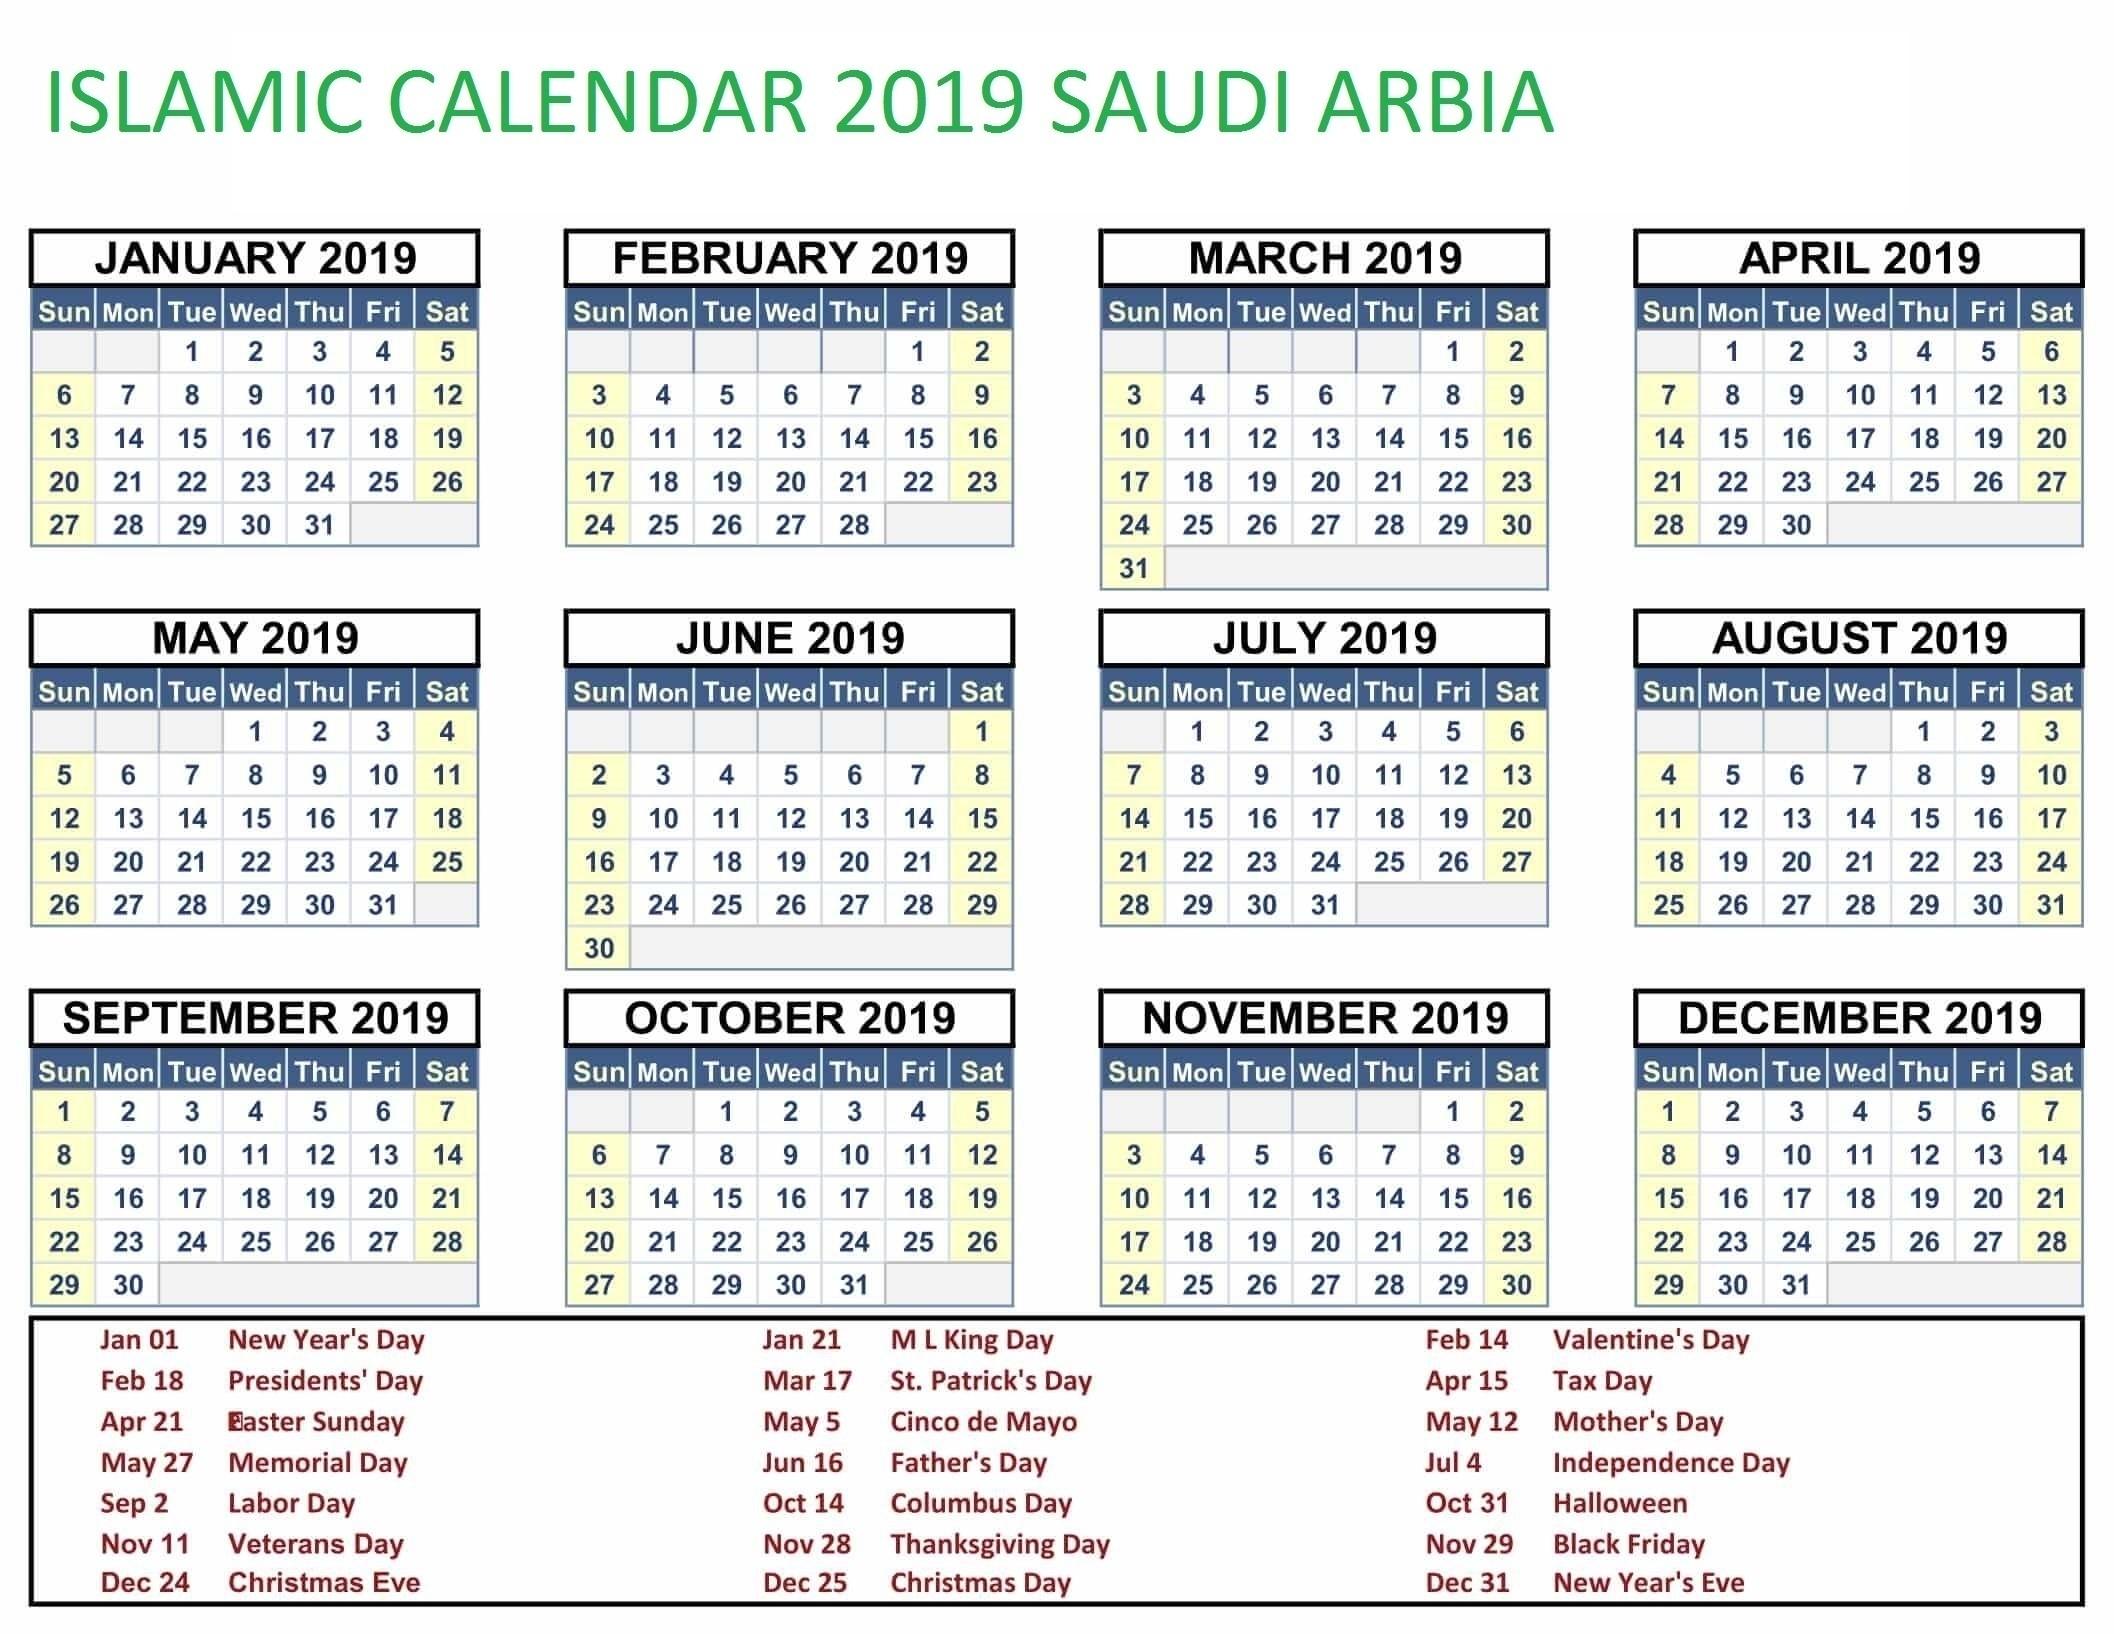 Saudi Islamic Month Kalendar Com | Template Calendar Printable intended for Saudi Islamic Month Kalendar Com